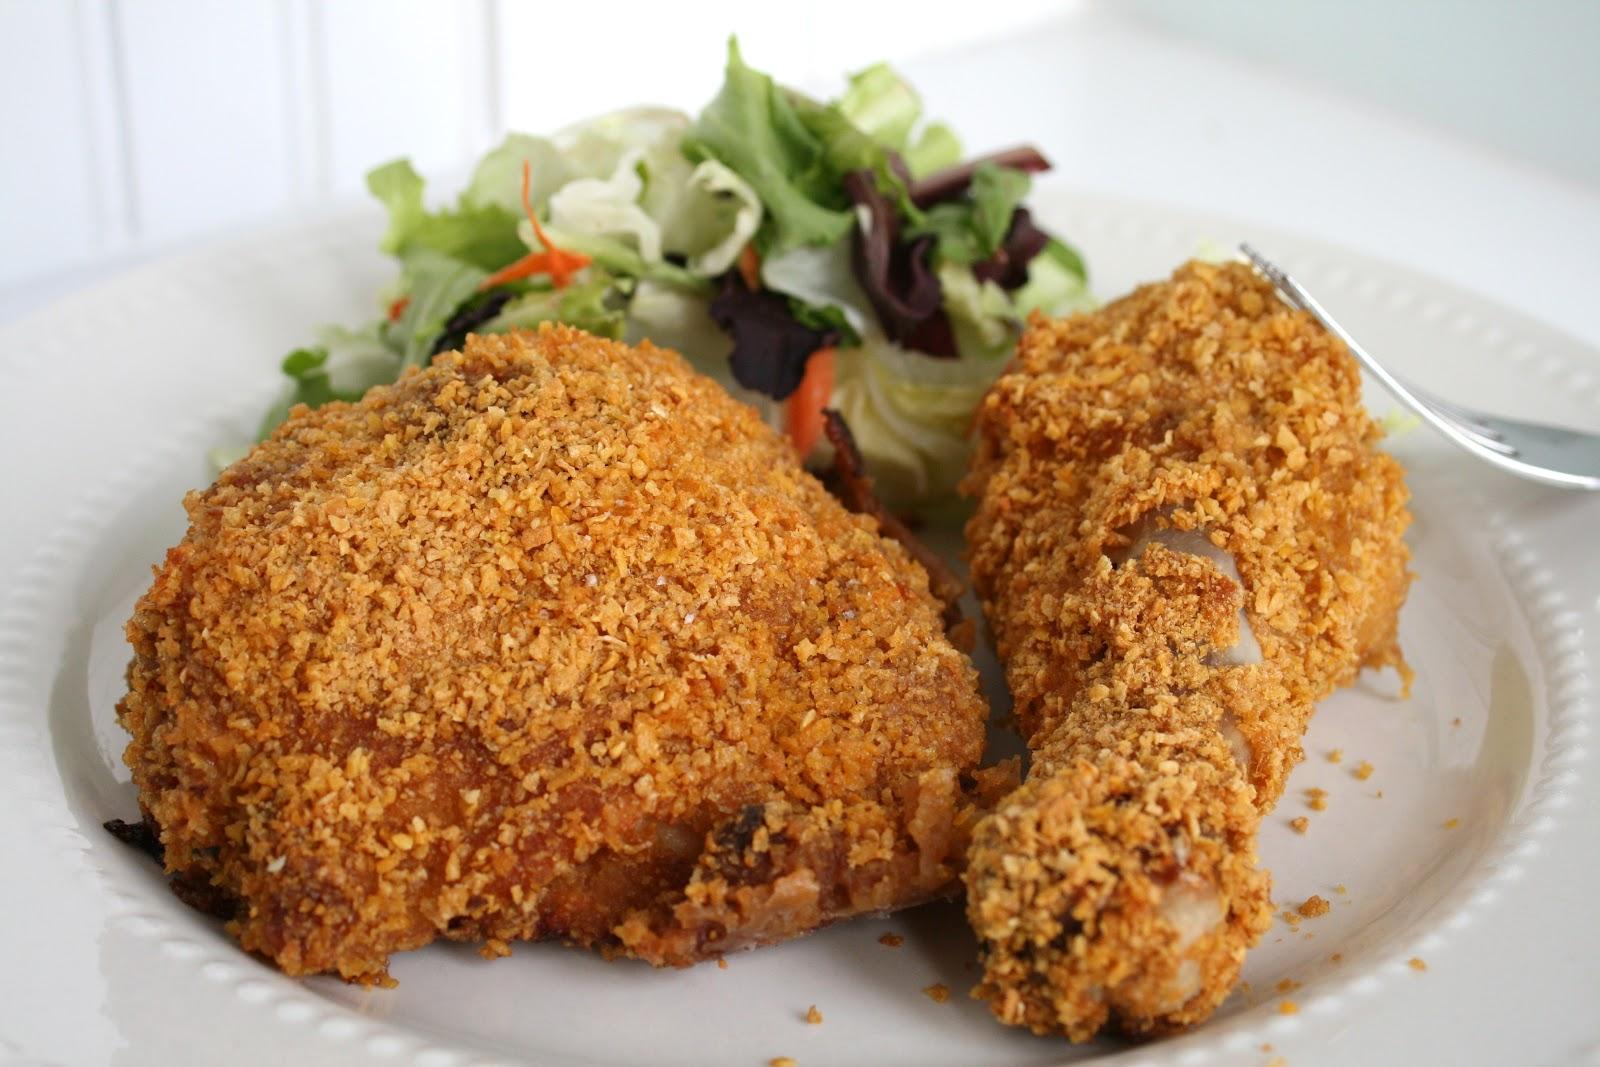 chicken crunchy oven fried corn flake crispy fried chickenâ corn